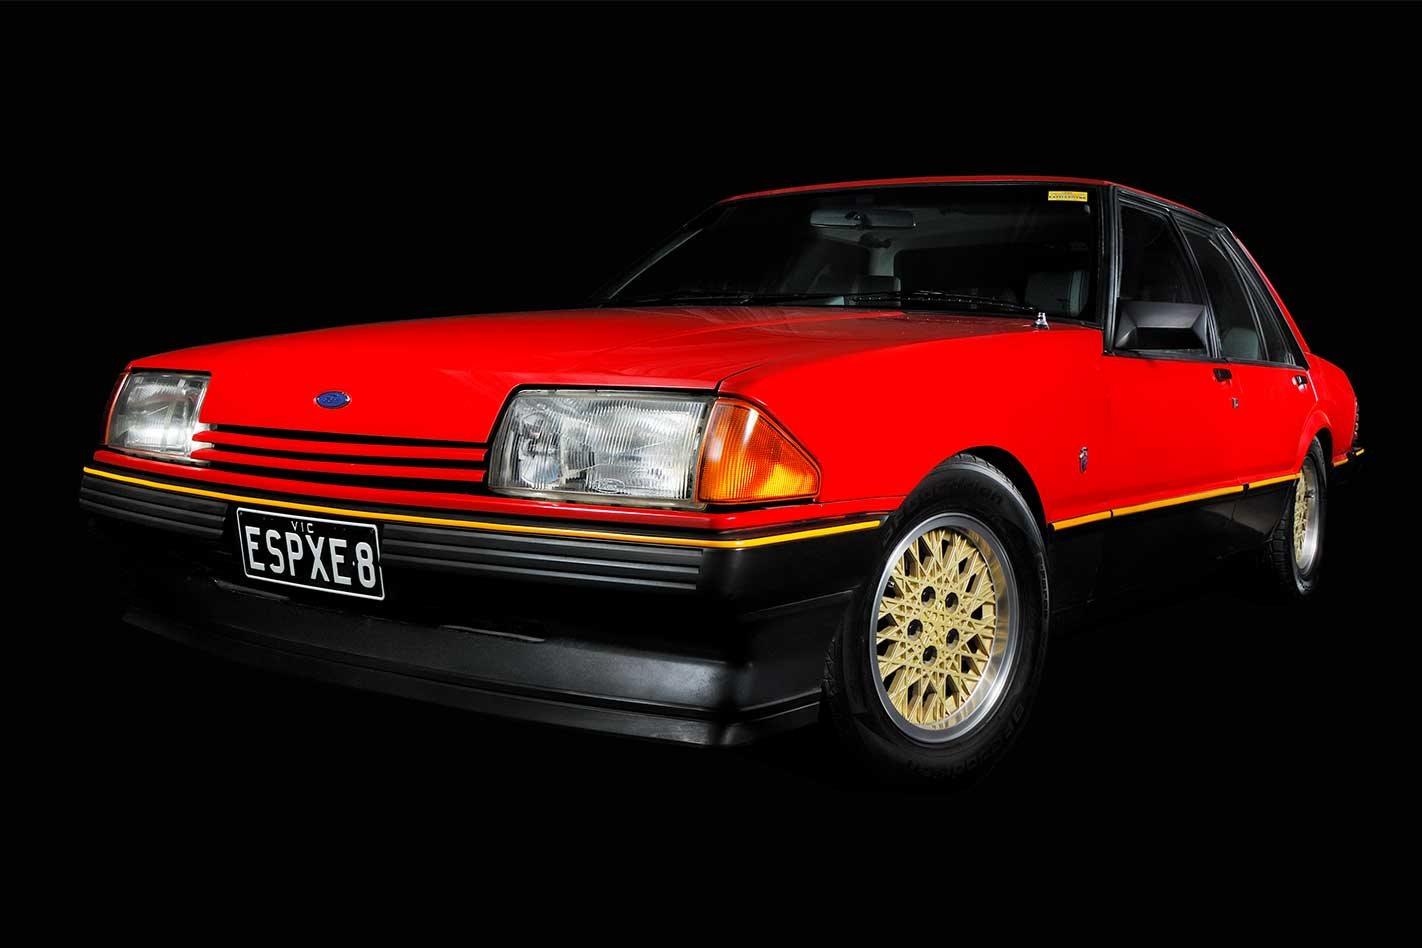 1982 ford falcon xe esp legend series